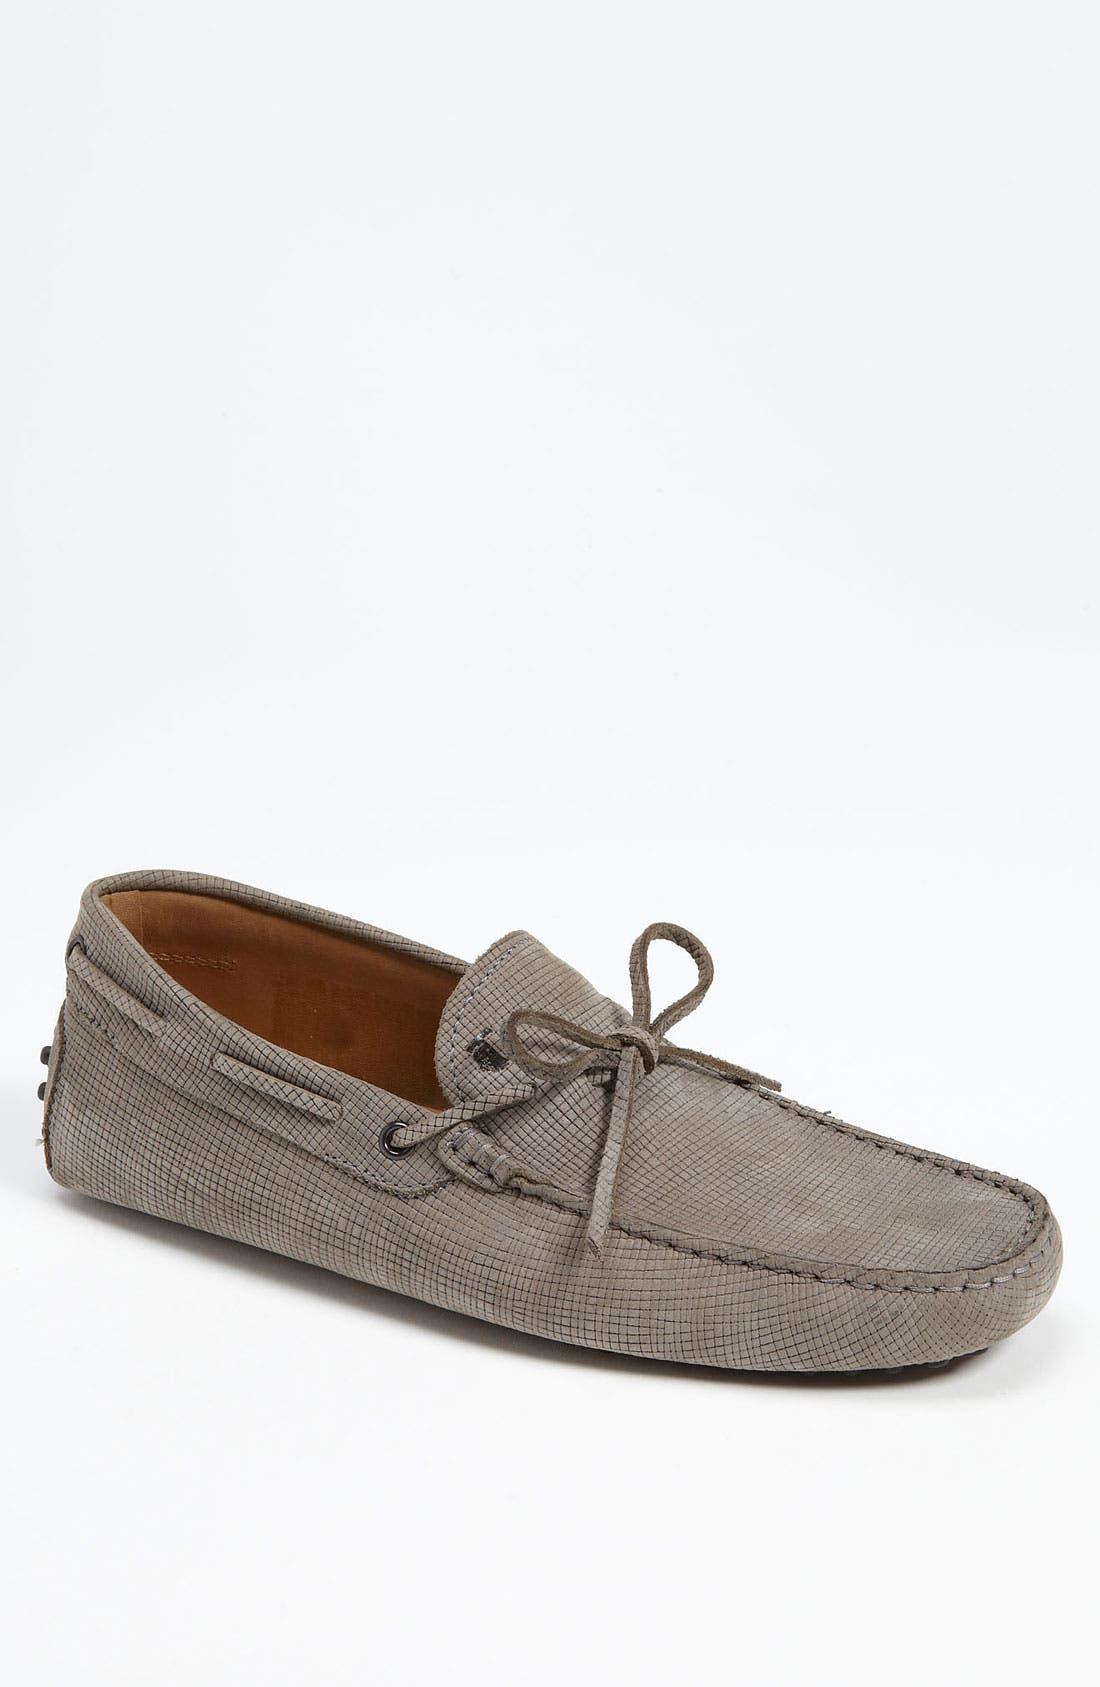 Main Image - Tod's 'Giommini' Driving Shoe